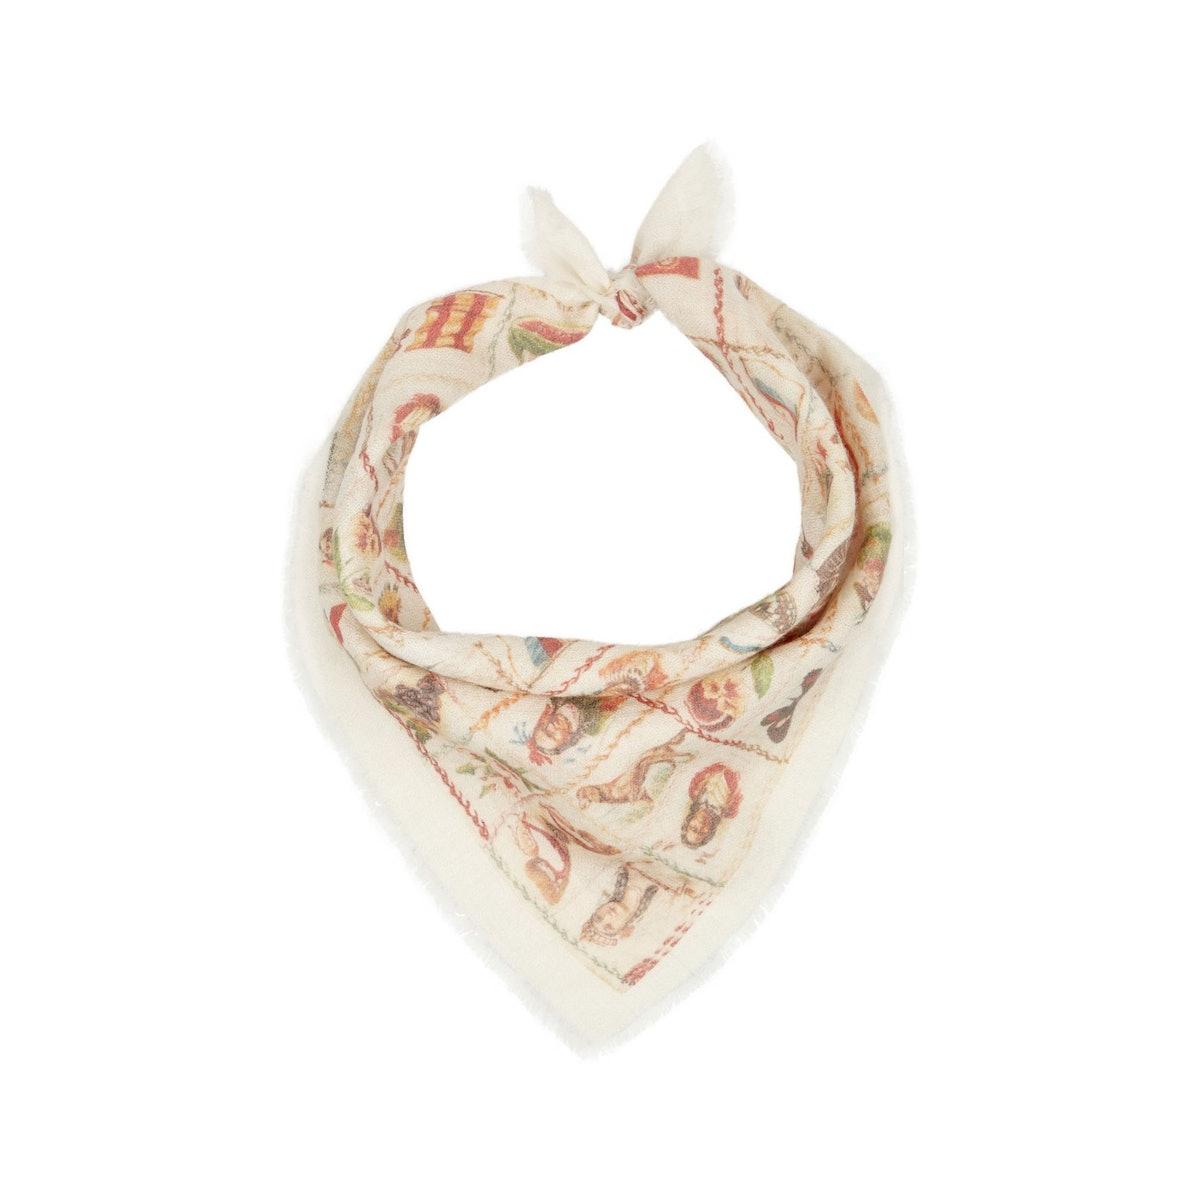 The Elder Statesman + Wear LACMA scarf